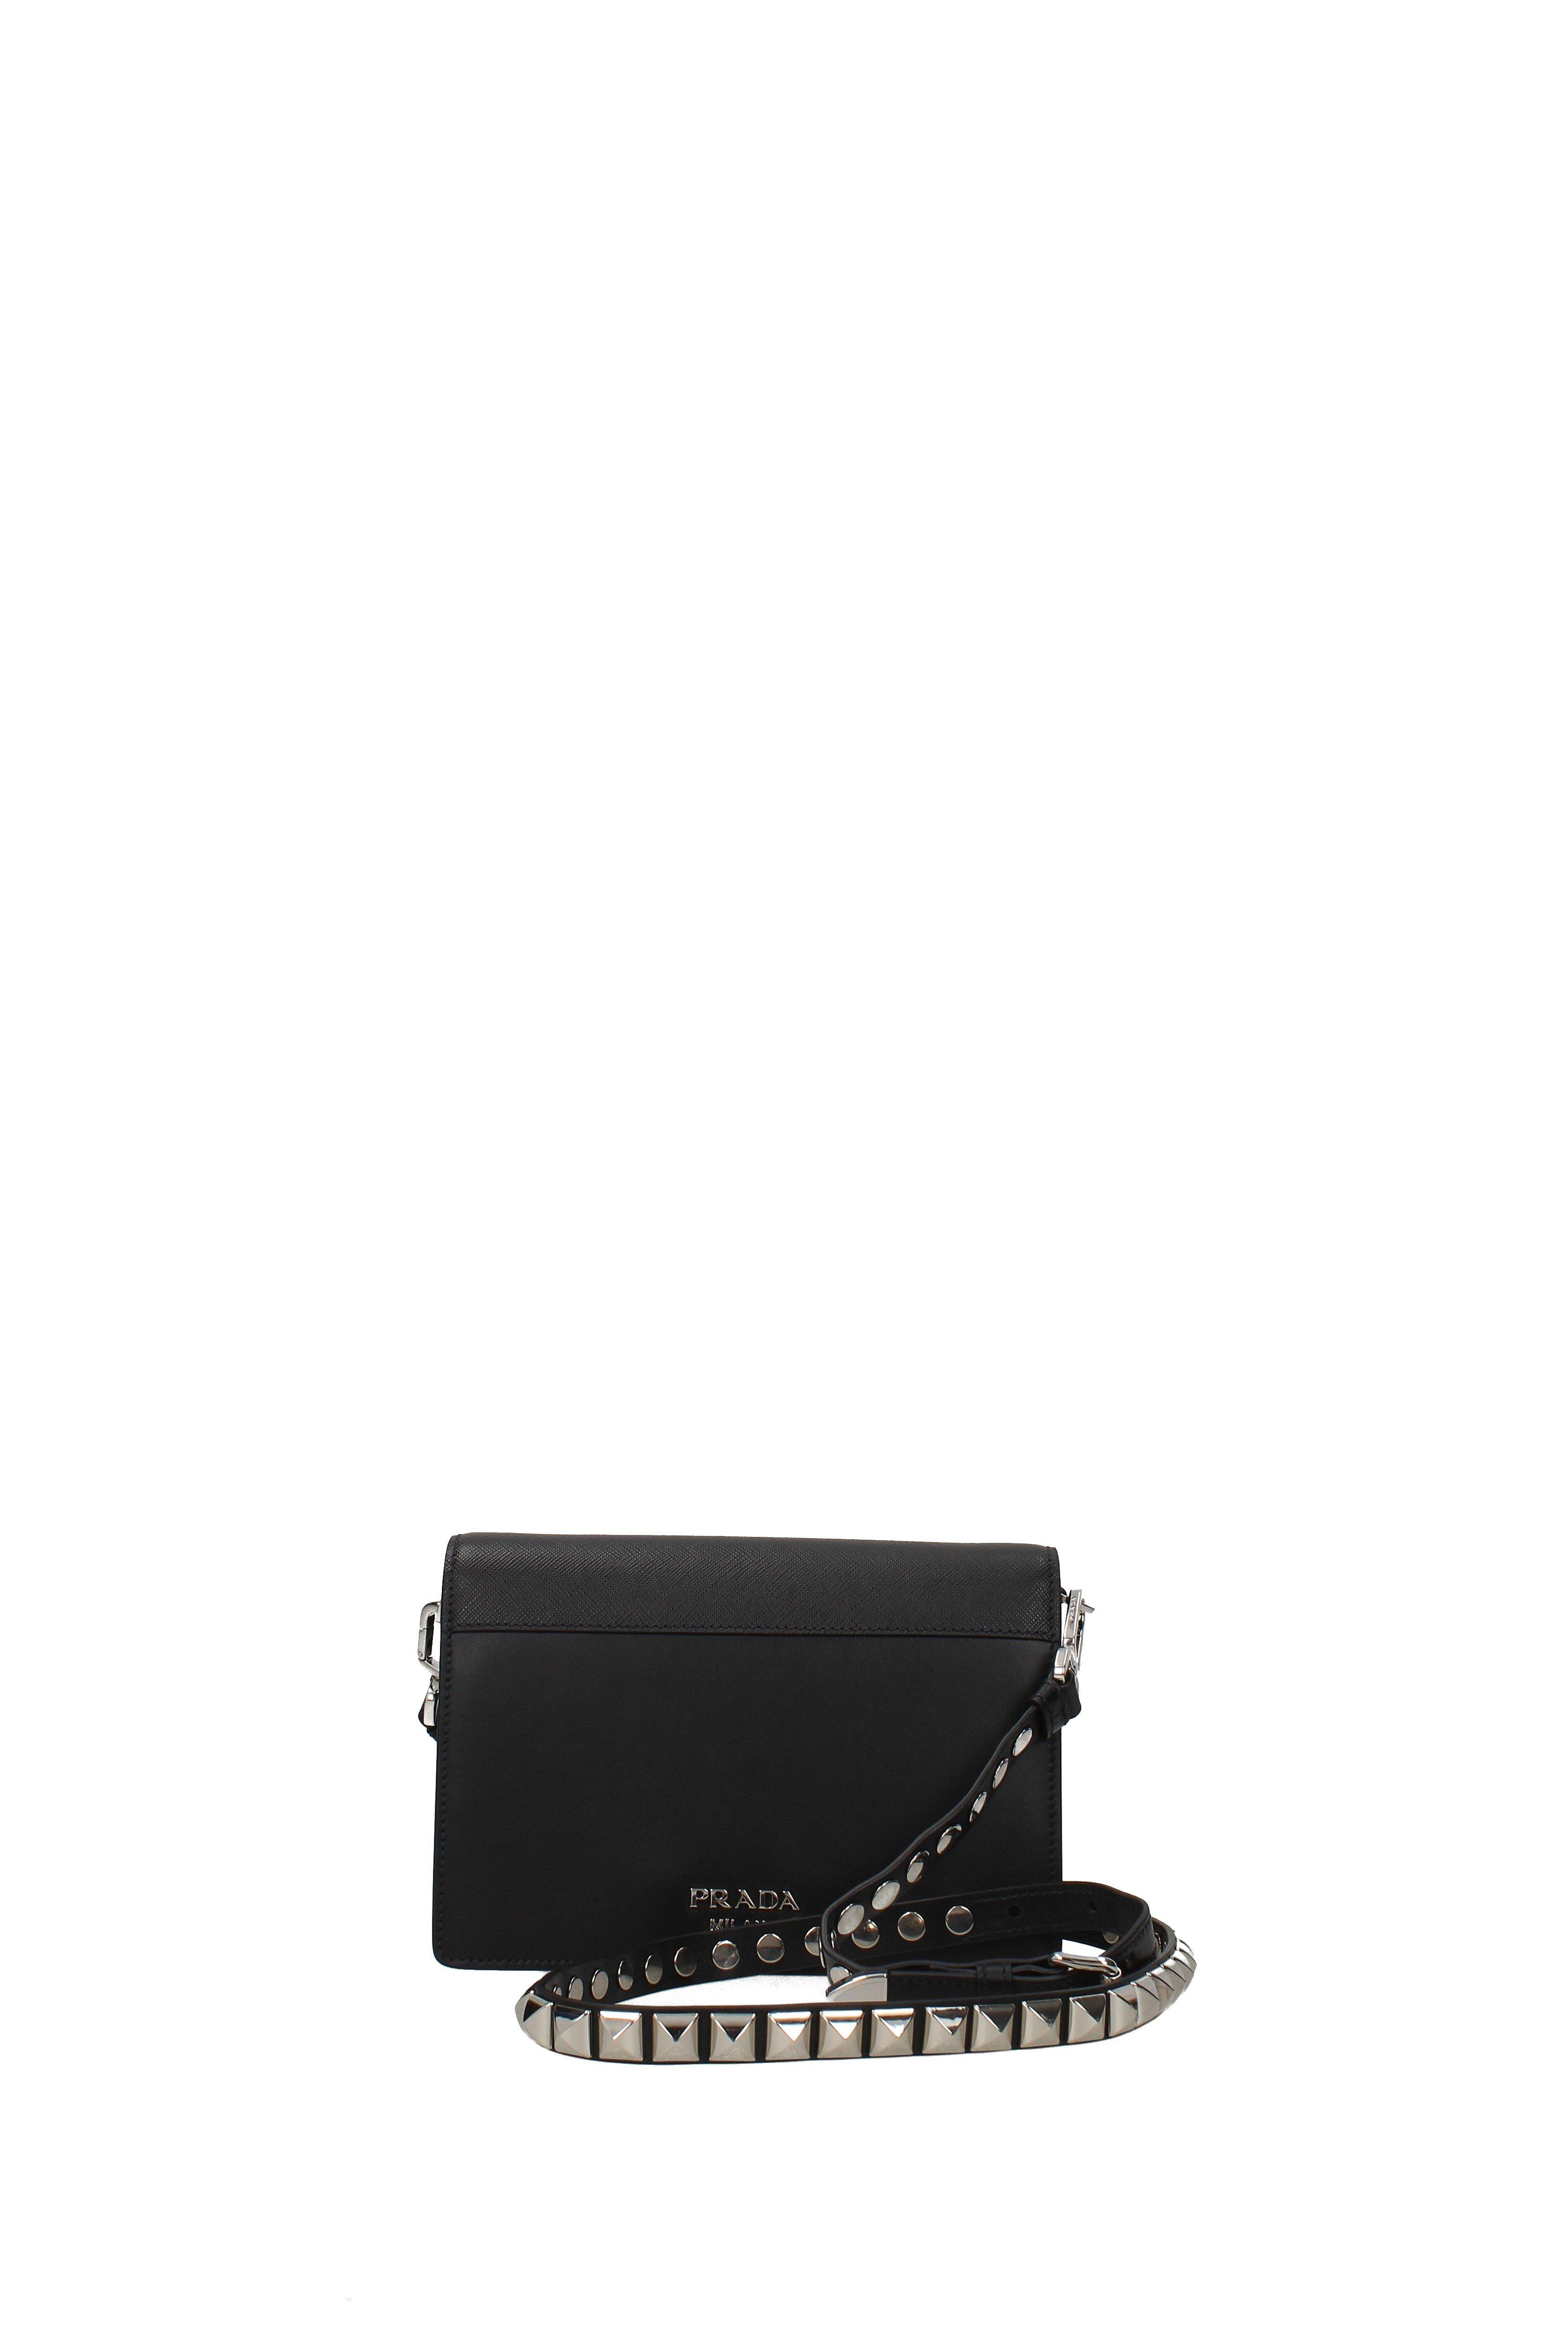 496f32afc53e Prada - Crossbody Bag Women Black - Lyst. View fullscreen